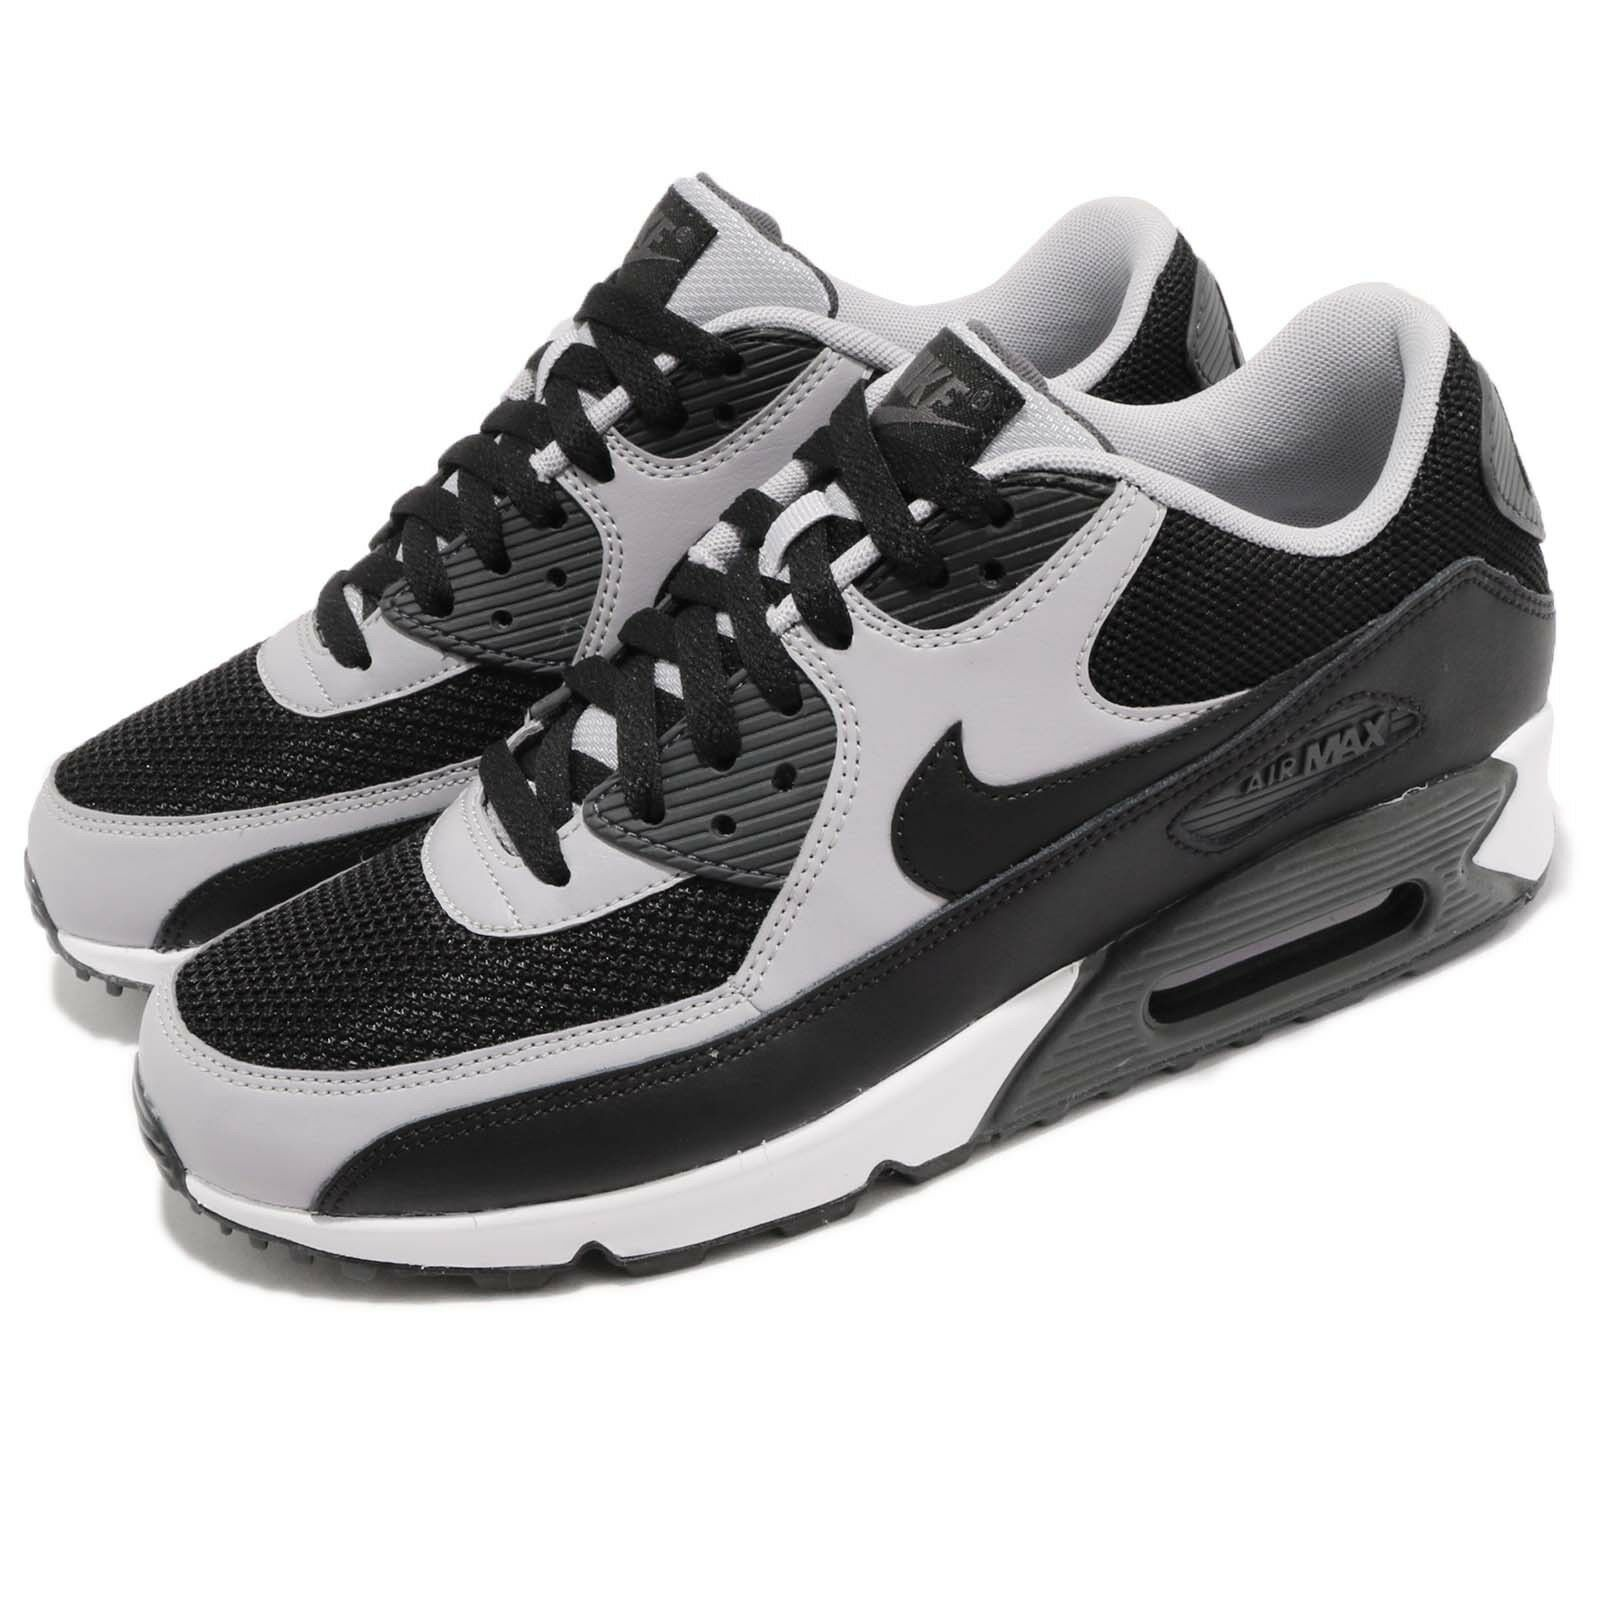 Nike Air Max Grey 90 Essential Black Wolf Grey Max Mens Running Shoes 537384-053 874a12